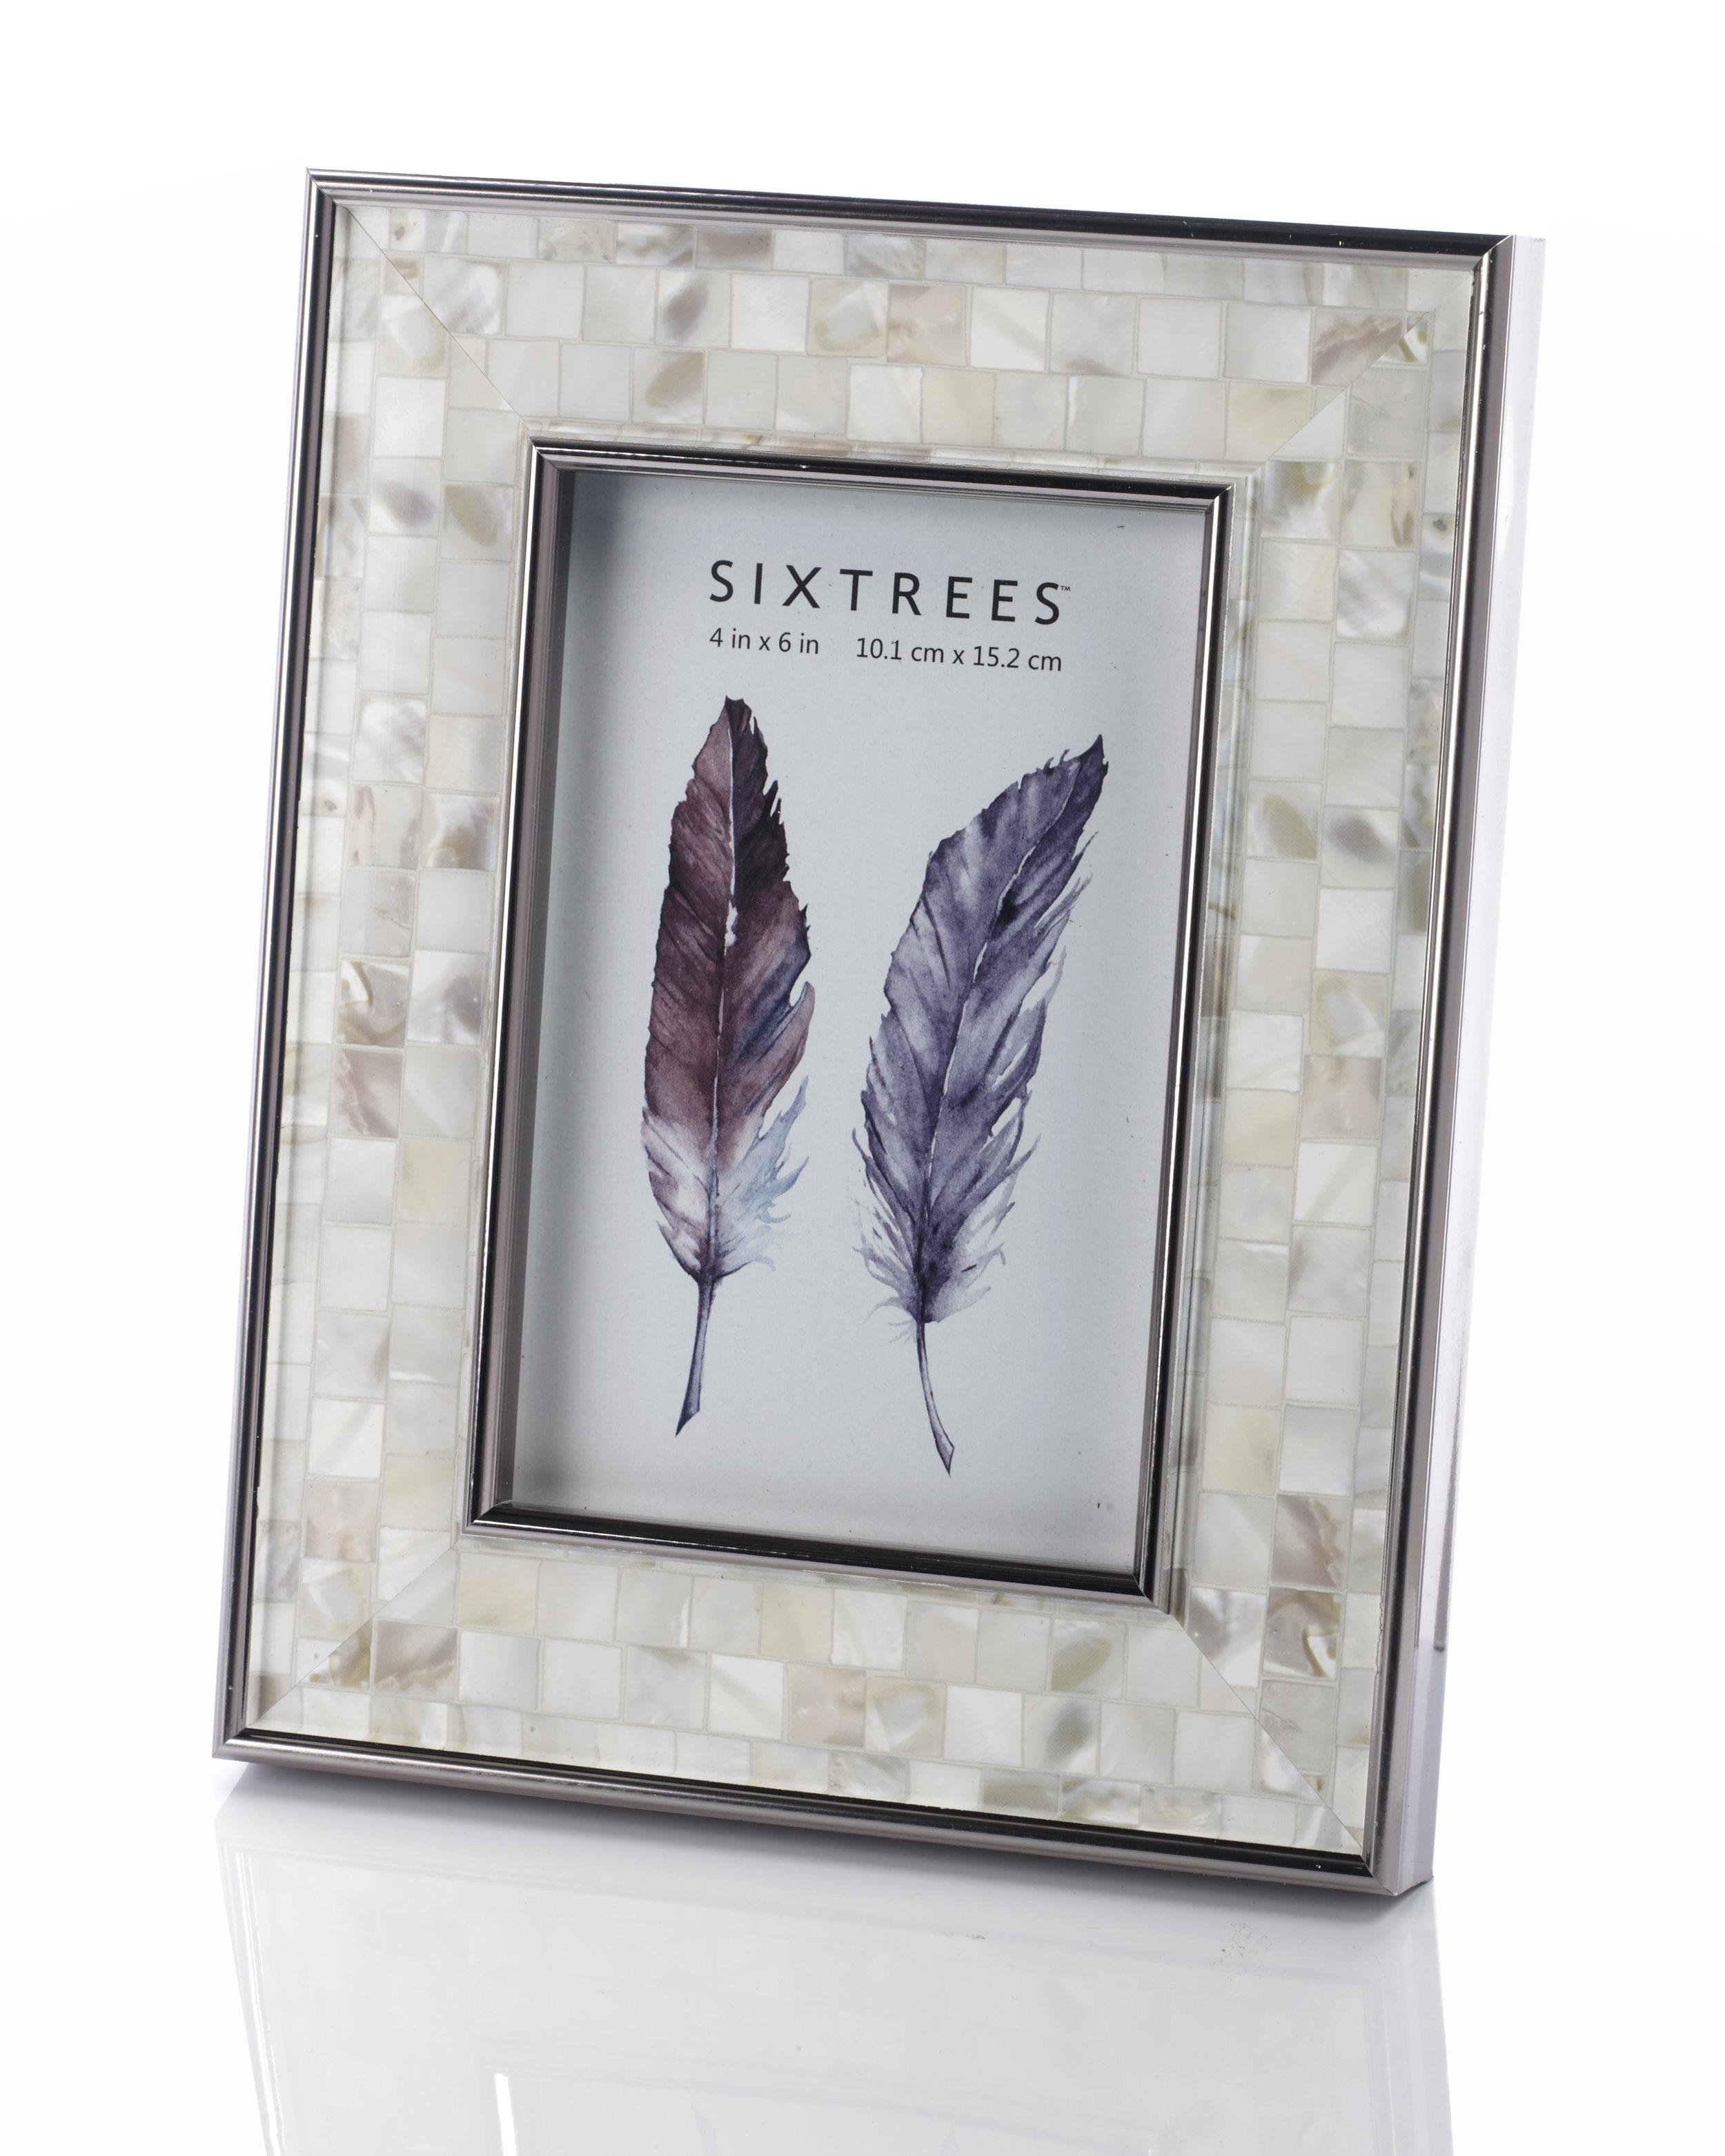 Sixtrees_frames.jpg